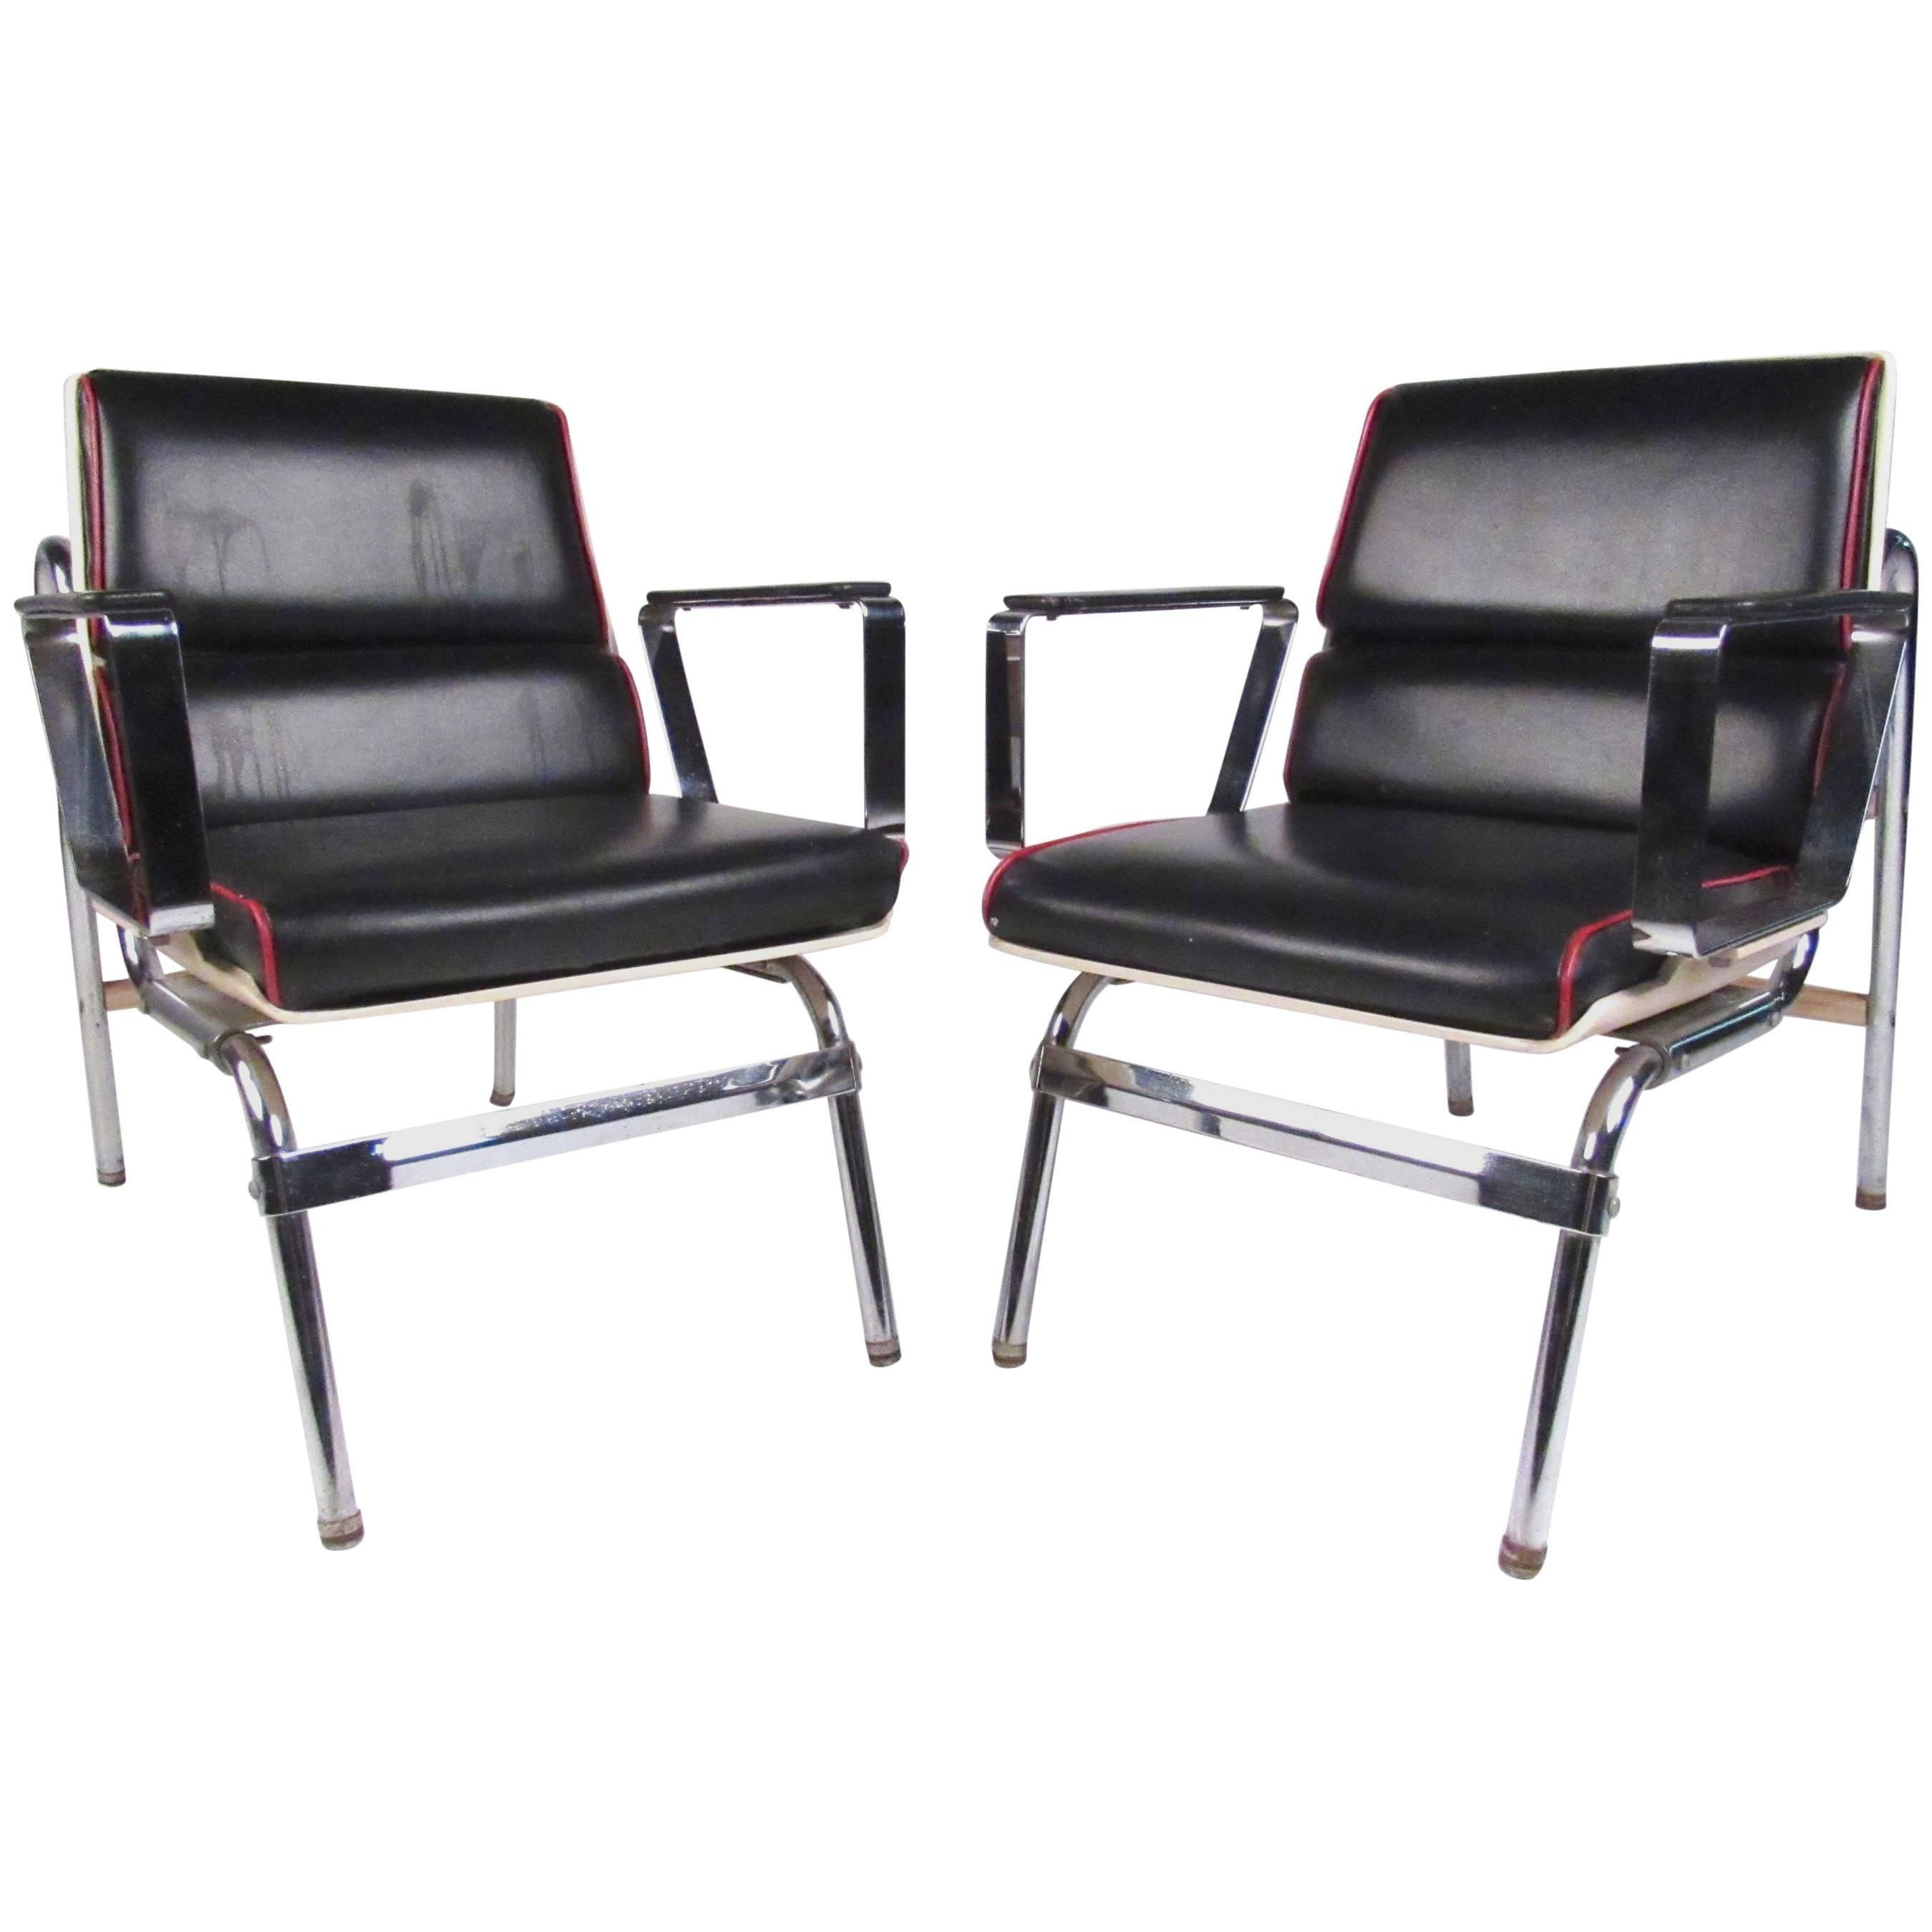 Pair of Stylish Vintage Modern Chrome and Vinyl Belmont Armchairs